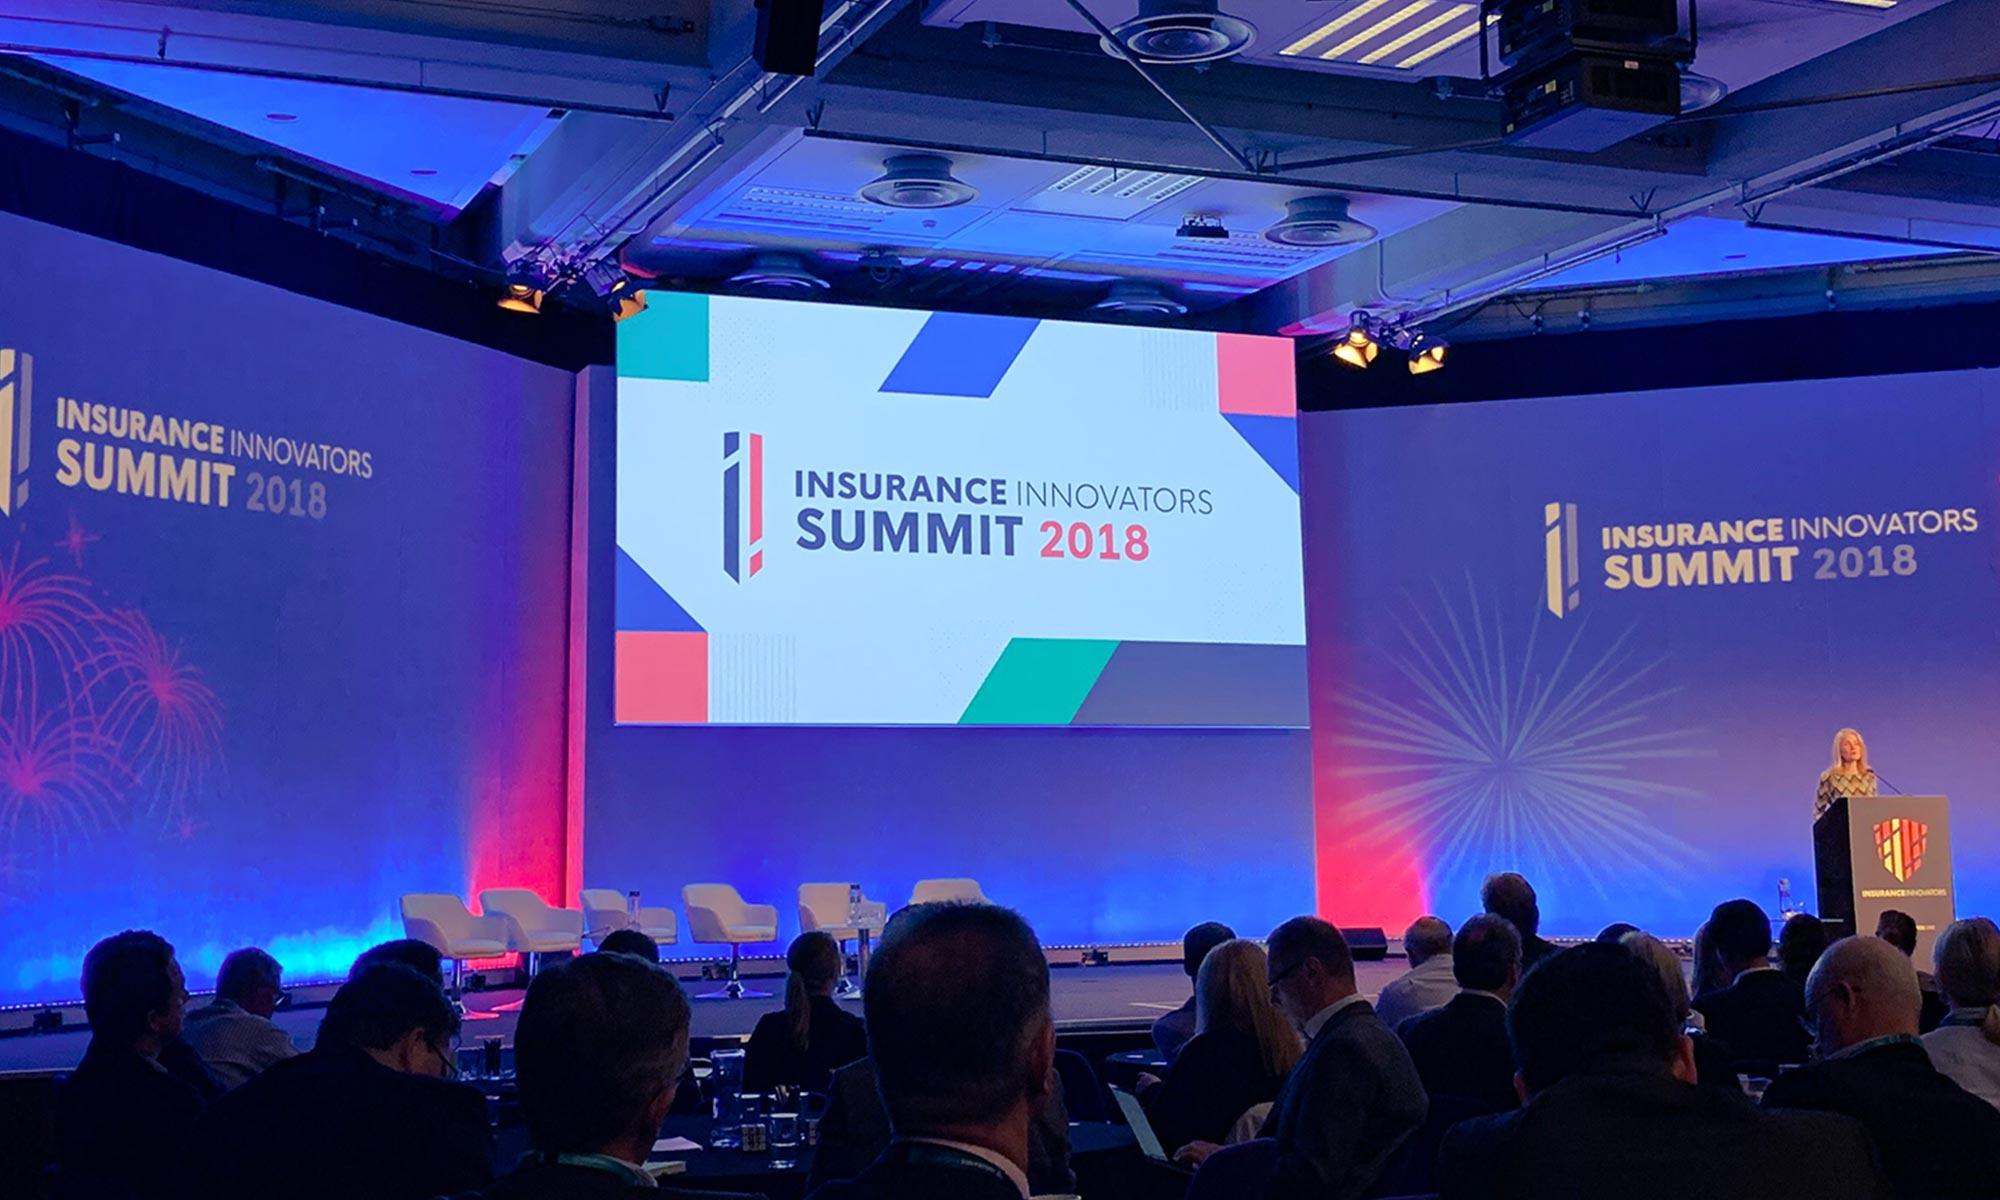 Insurance Innovators Summit London 2018